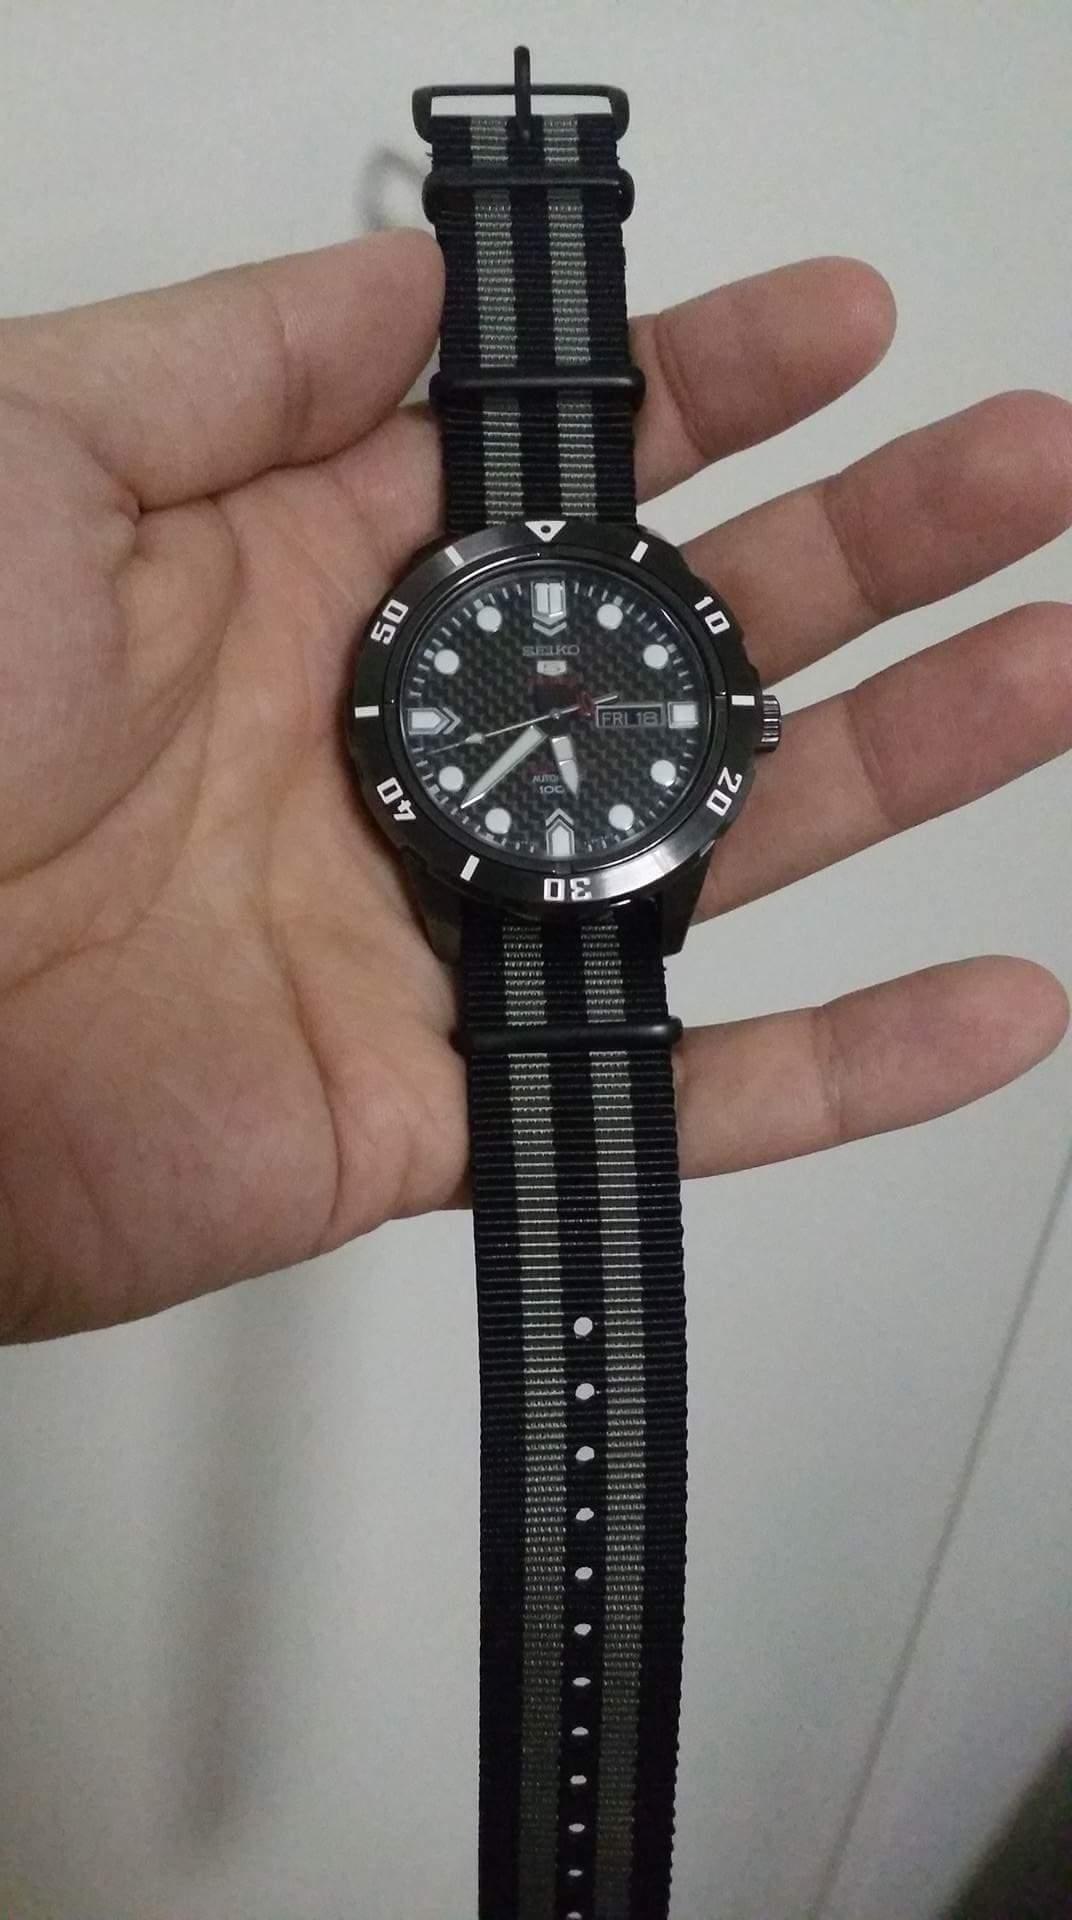 CUST-0129